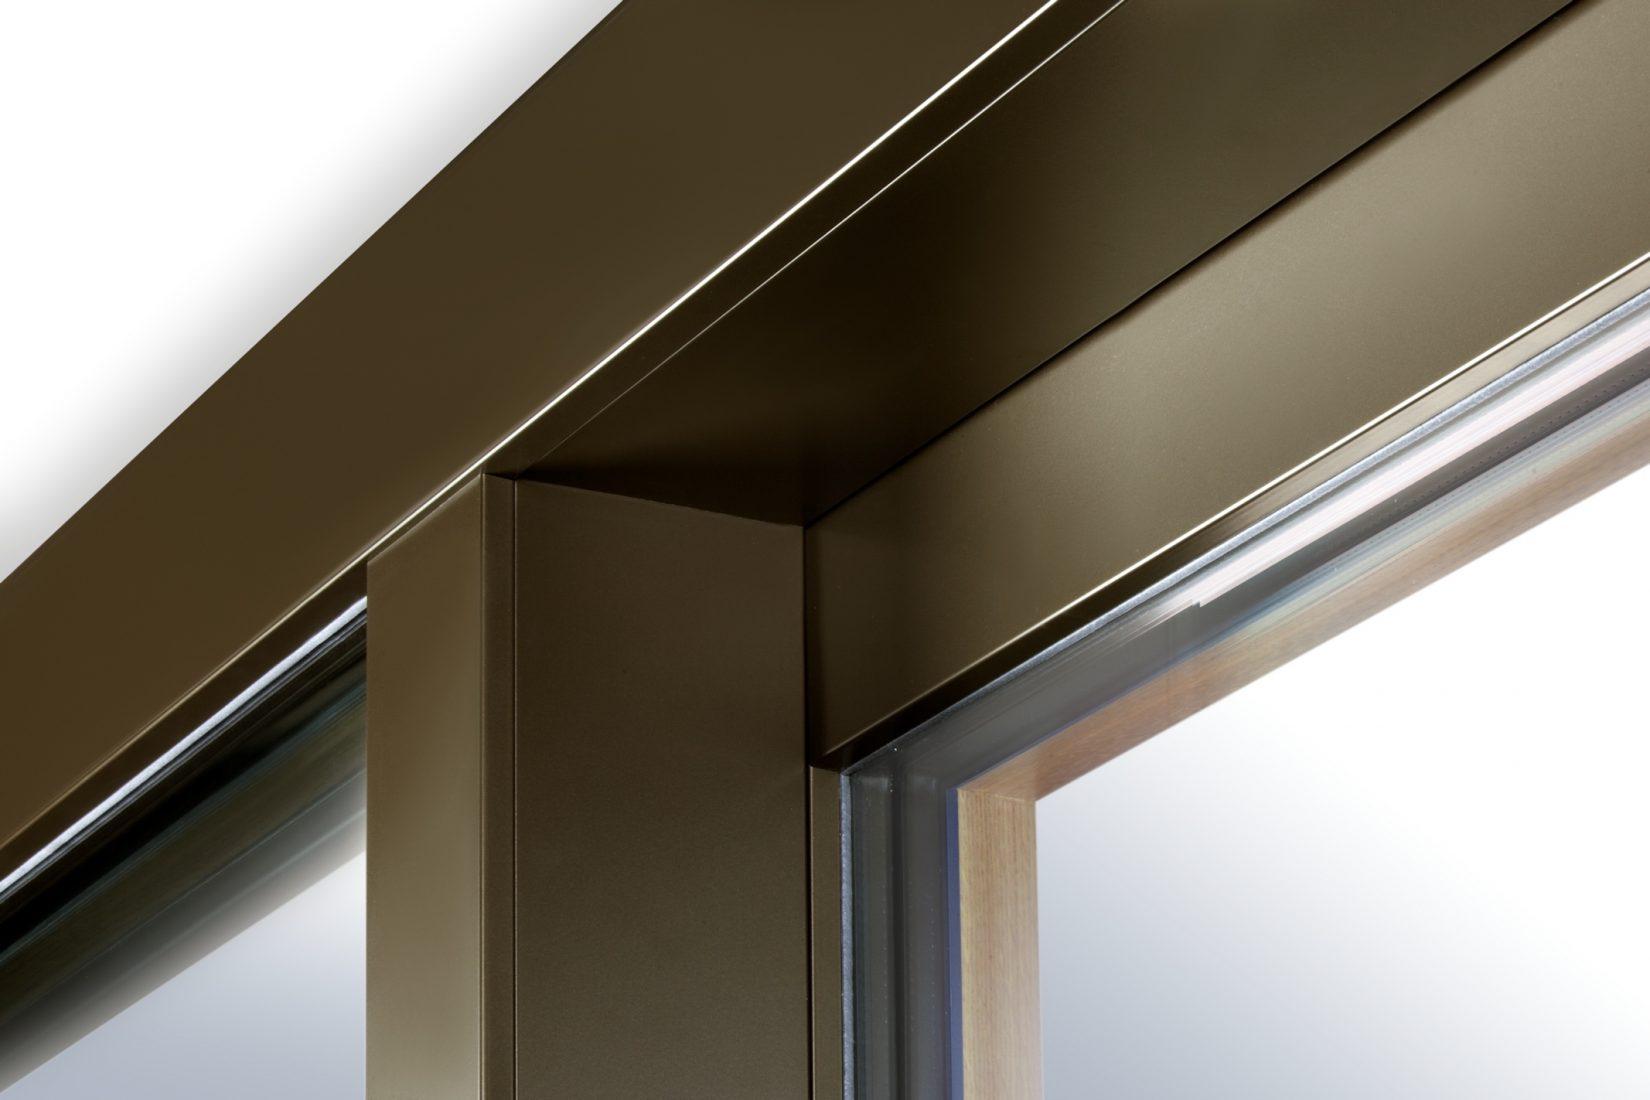 aluminium holz fenster hinterl ftung ist ein muss. Black Bedroom Furniture Sets. Home Design Ideas